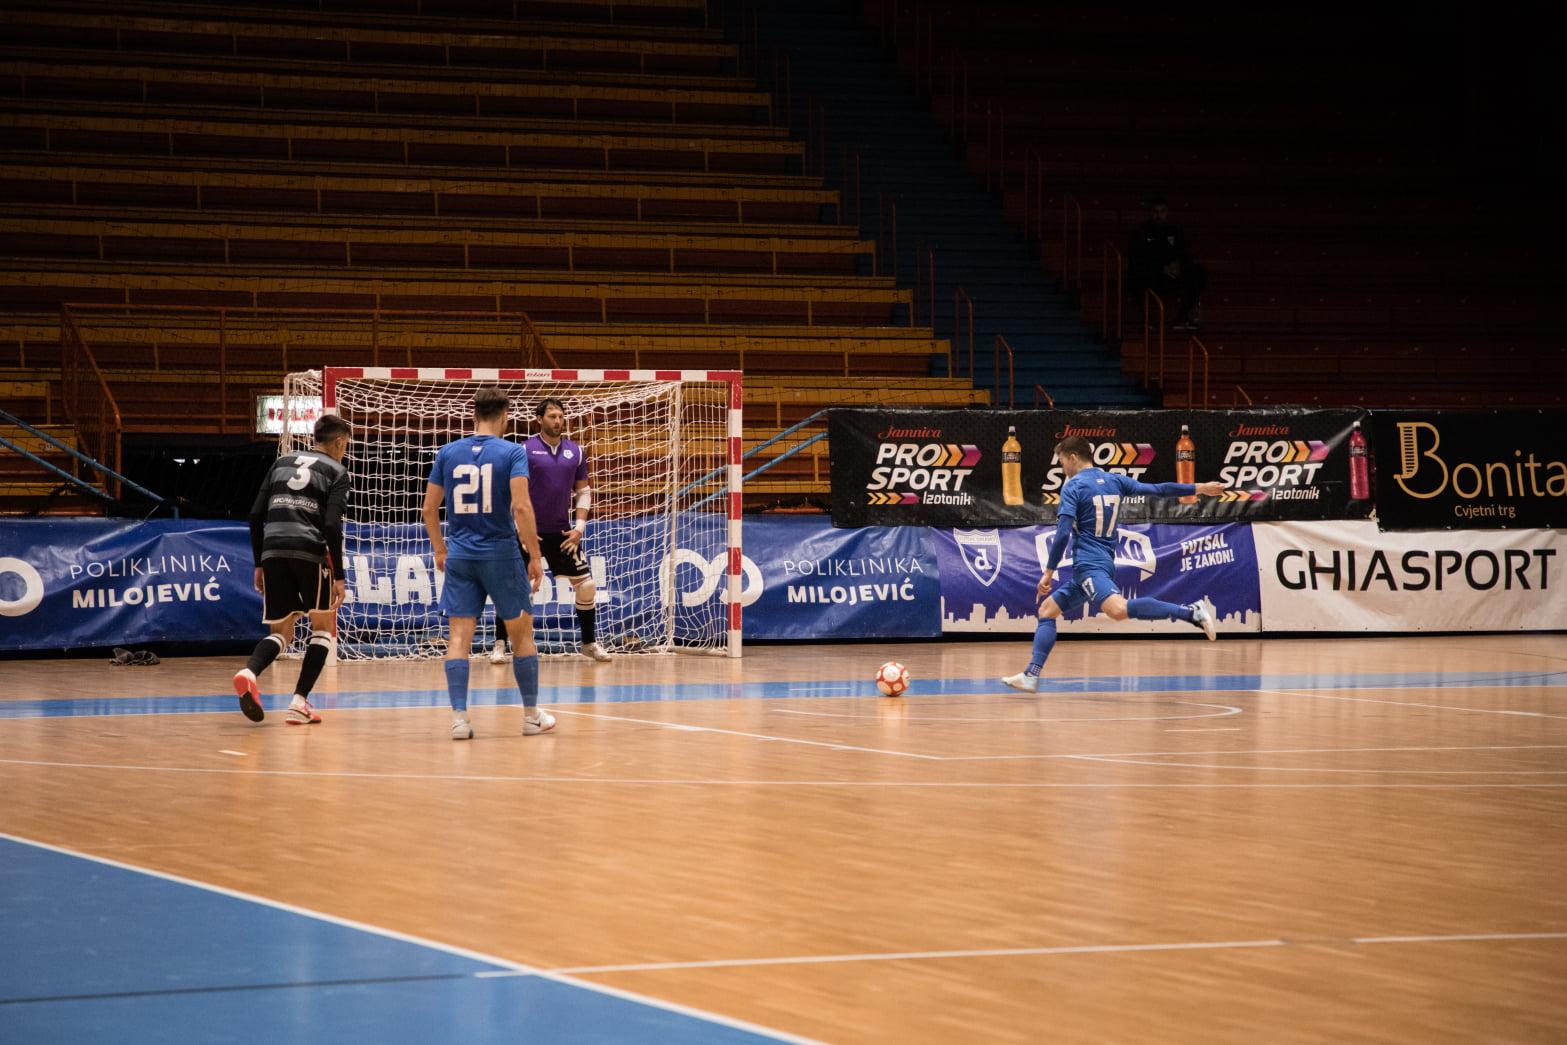 Universitas - Polufinale najava, druga utakmica